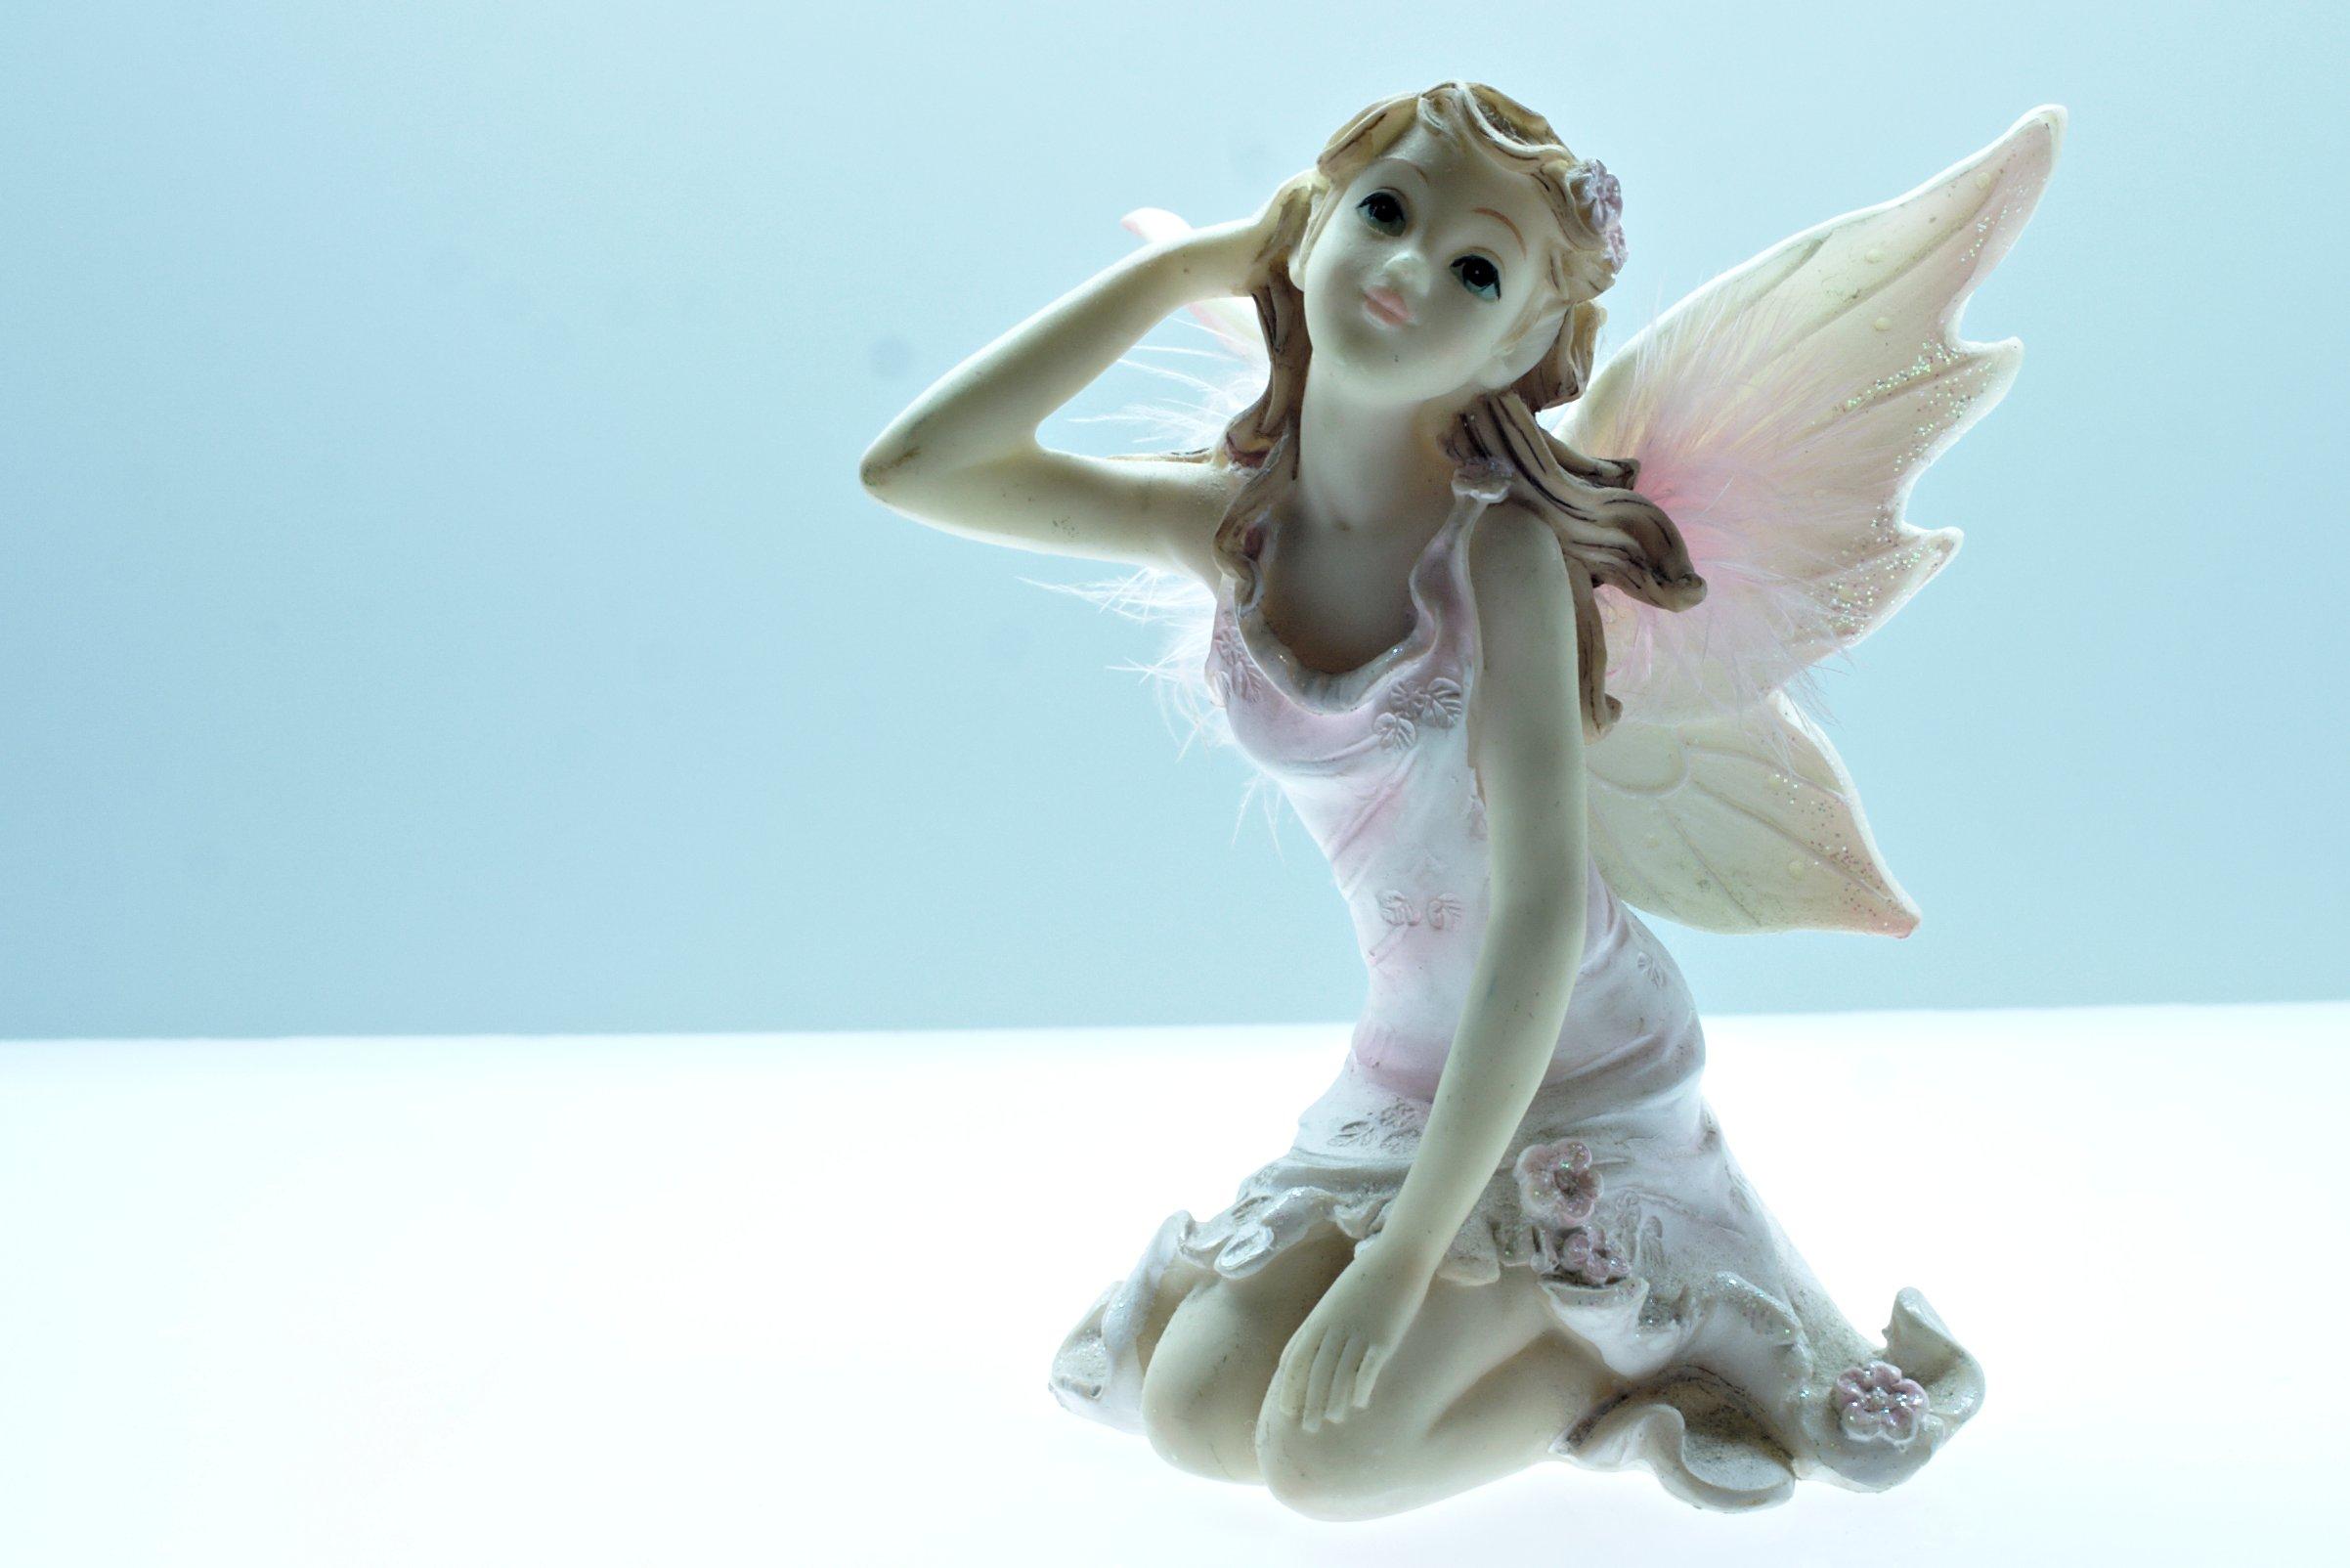 Angel figurine, Angel, Sitting, Object, Old, HQ Photo